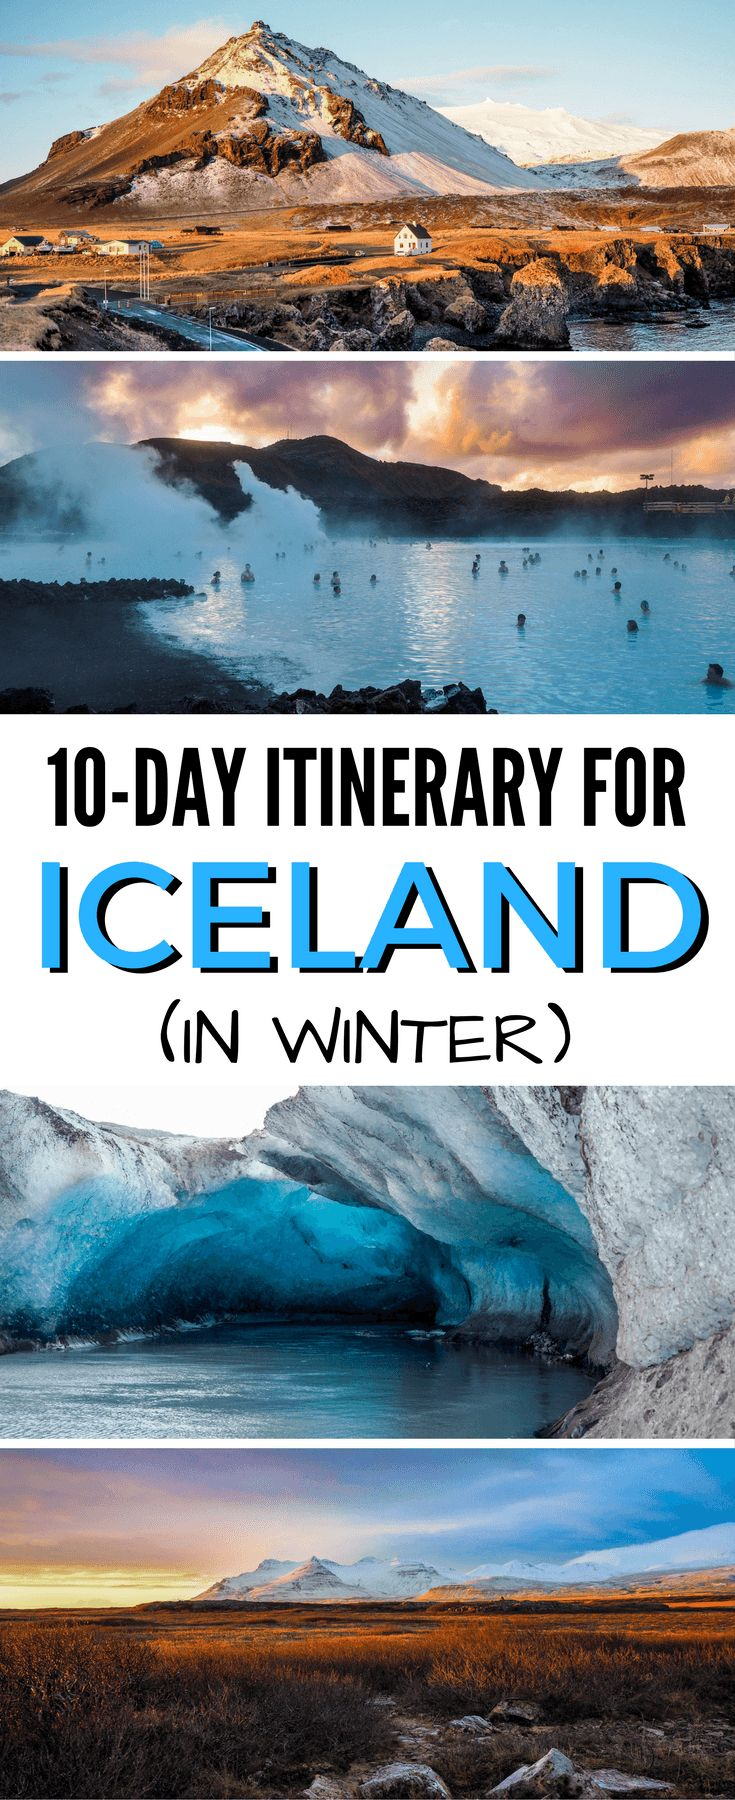 10 days in Iceland in winter |  Iceland travel itinerary | Iceland winter travel via @dangerousbiz